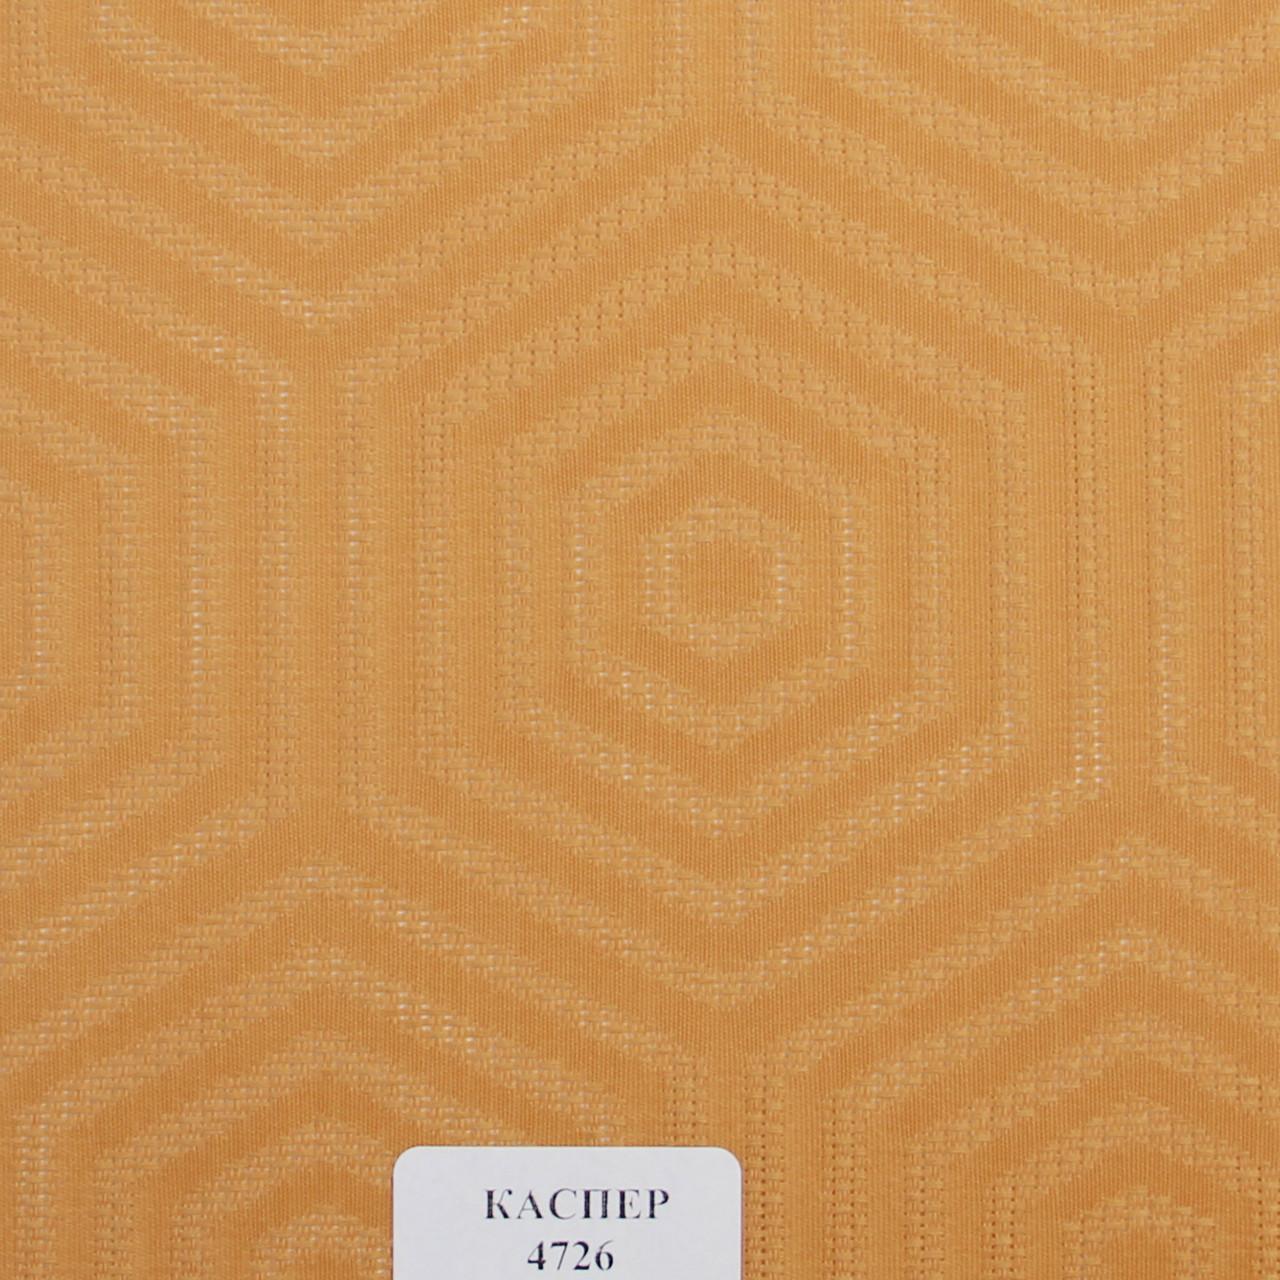 Рулонные шторы Ткань Каспер 4726 Коричневый